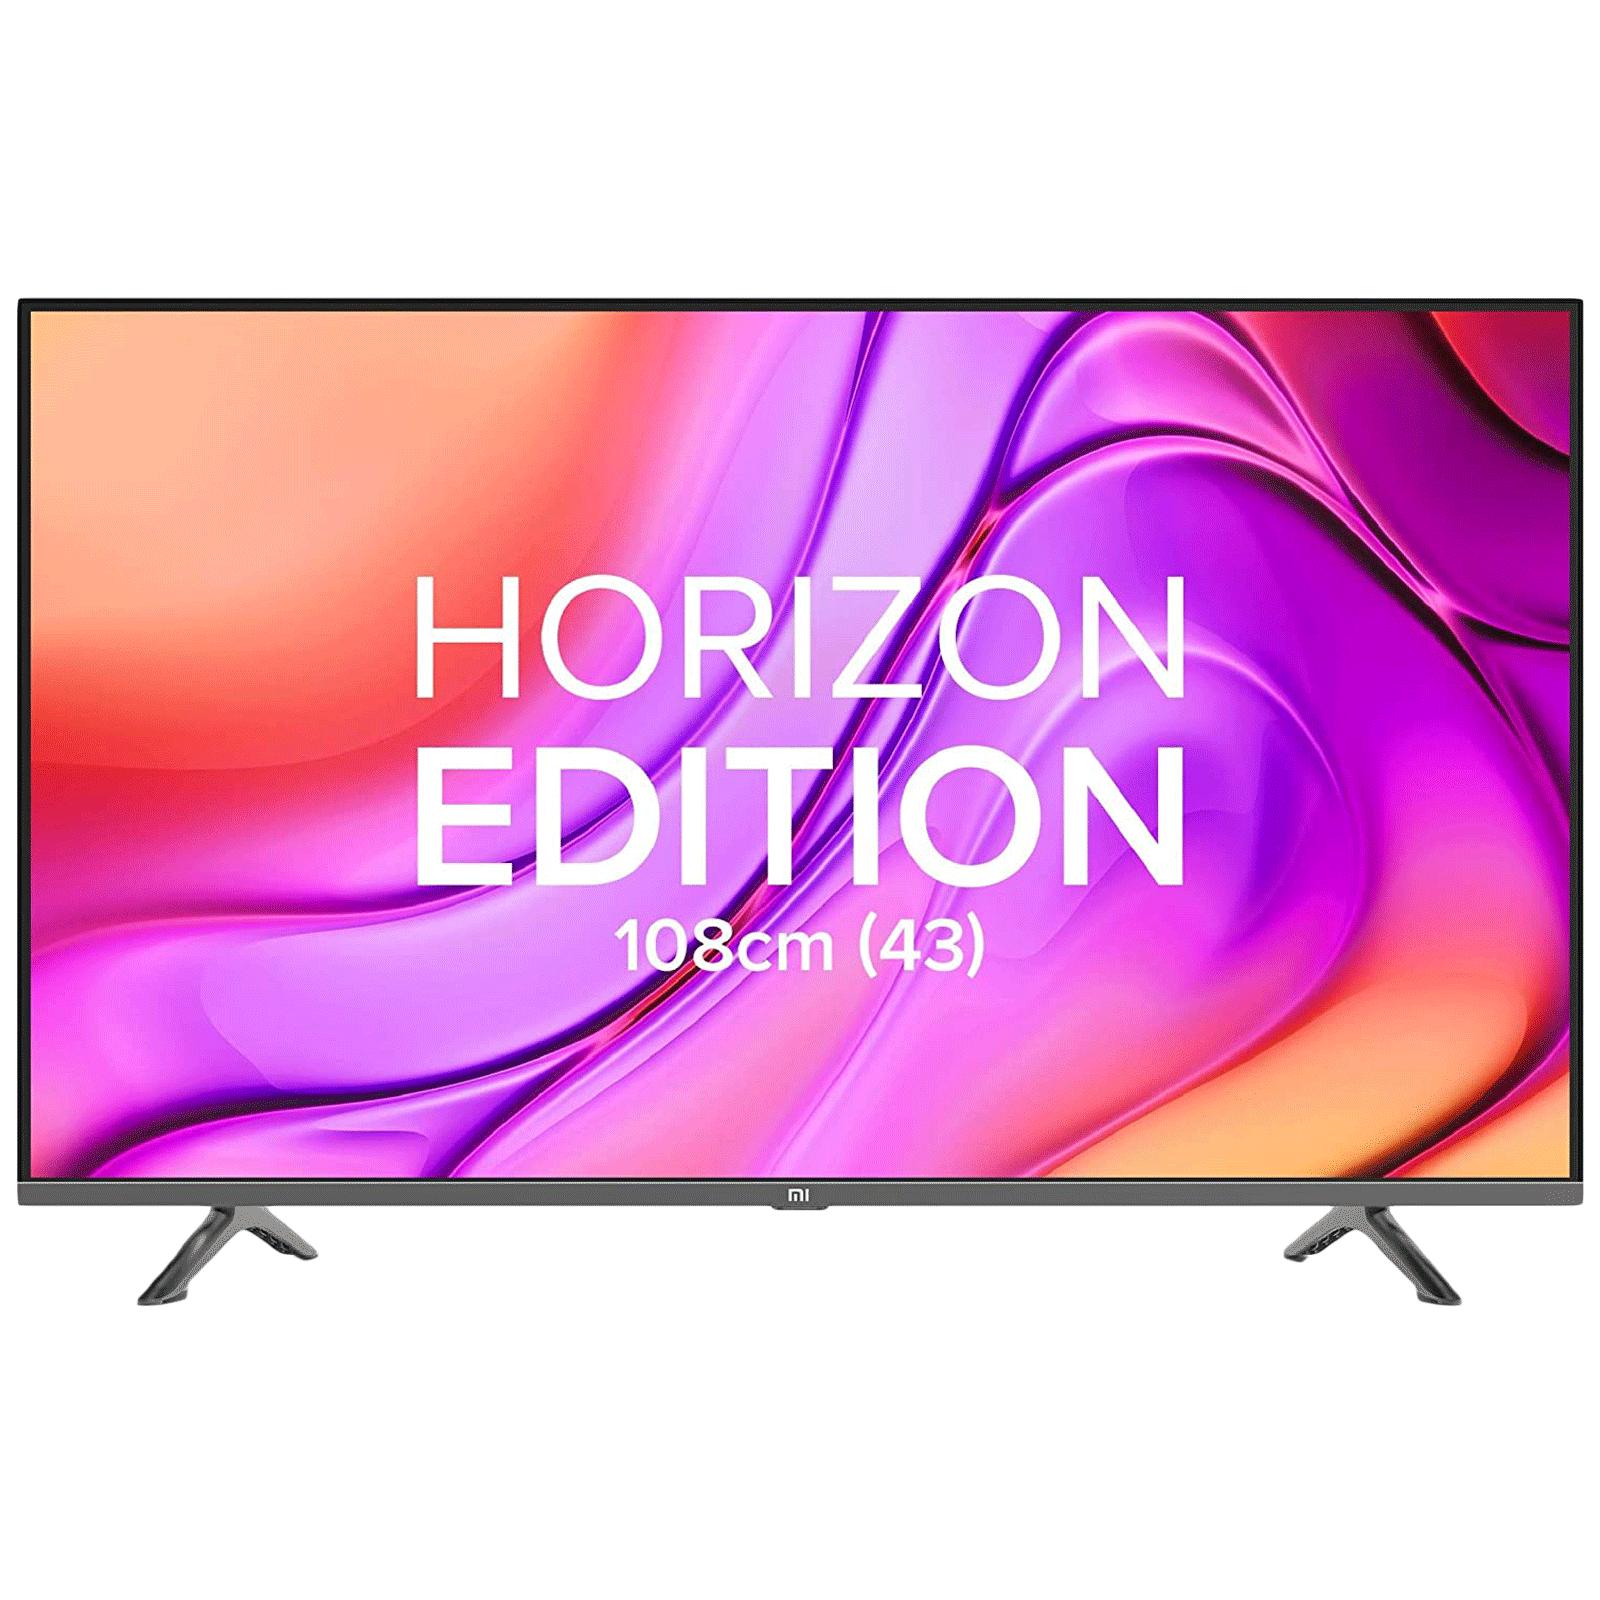 Xiaomi Mi 4A 43 Horizon 108cm (43 Inch) Full HD LED Android Smart TV (Vivid Picture Engine, 43ELA4548, Black)